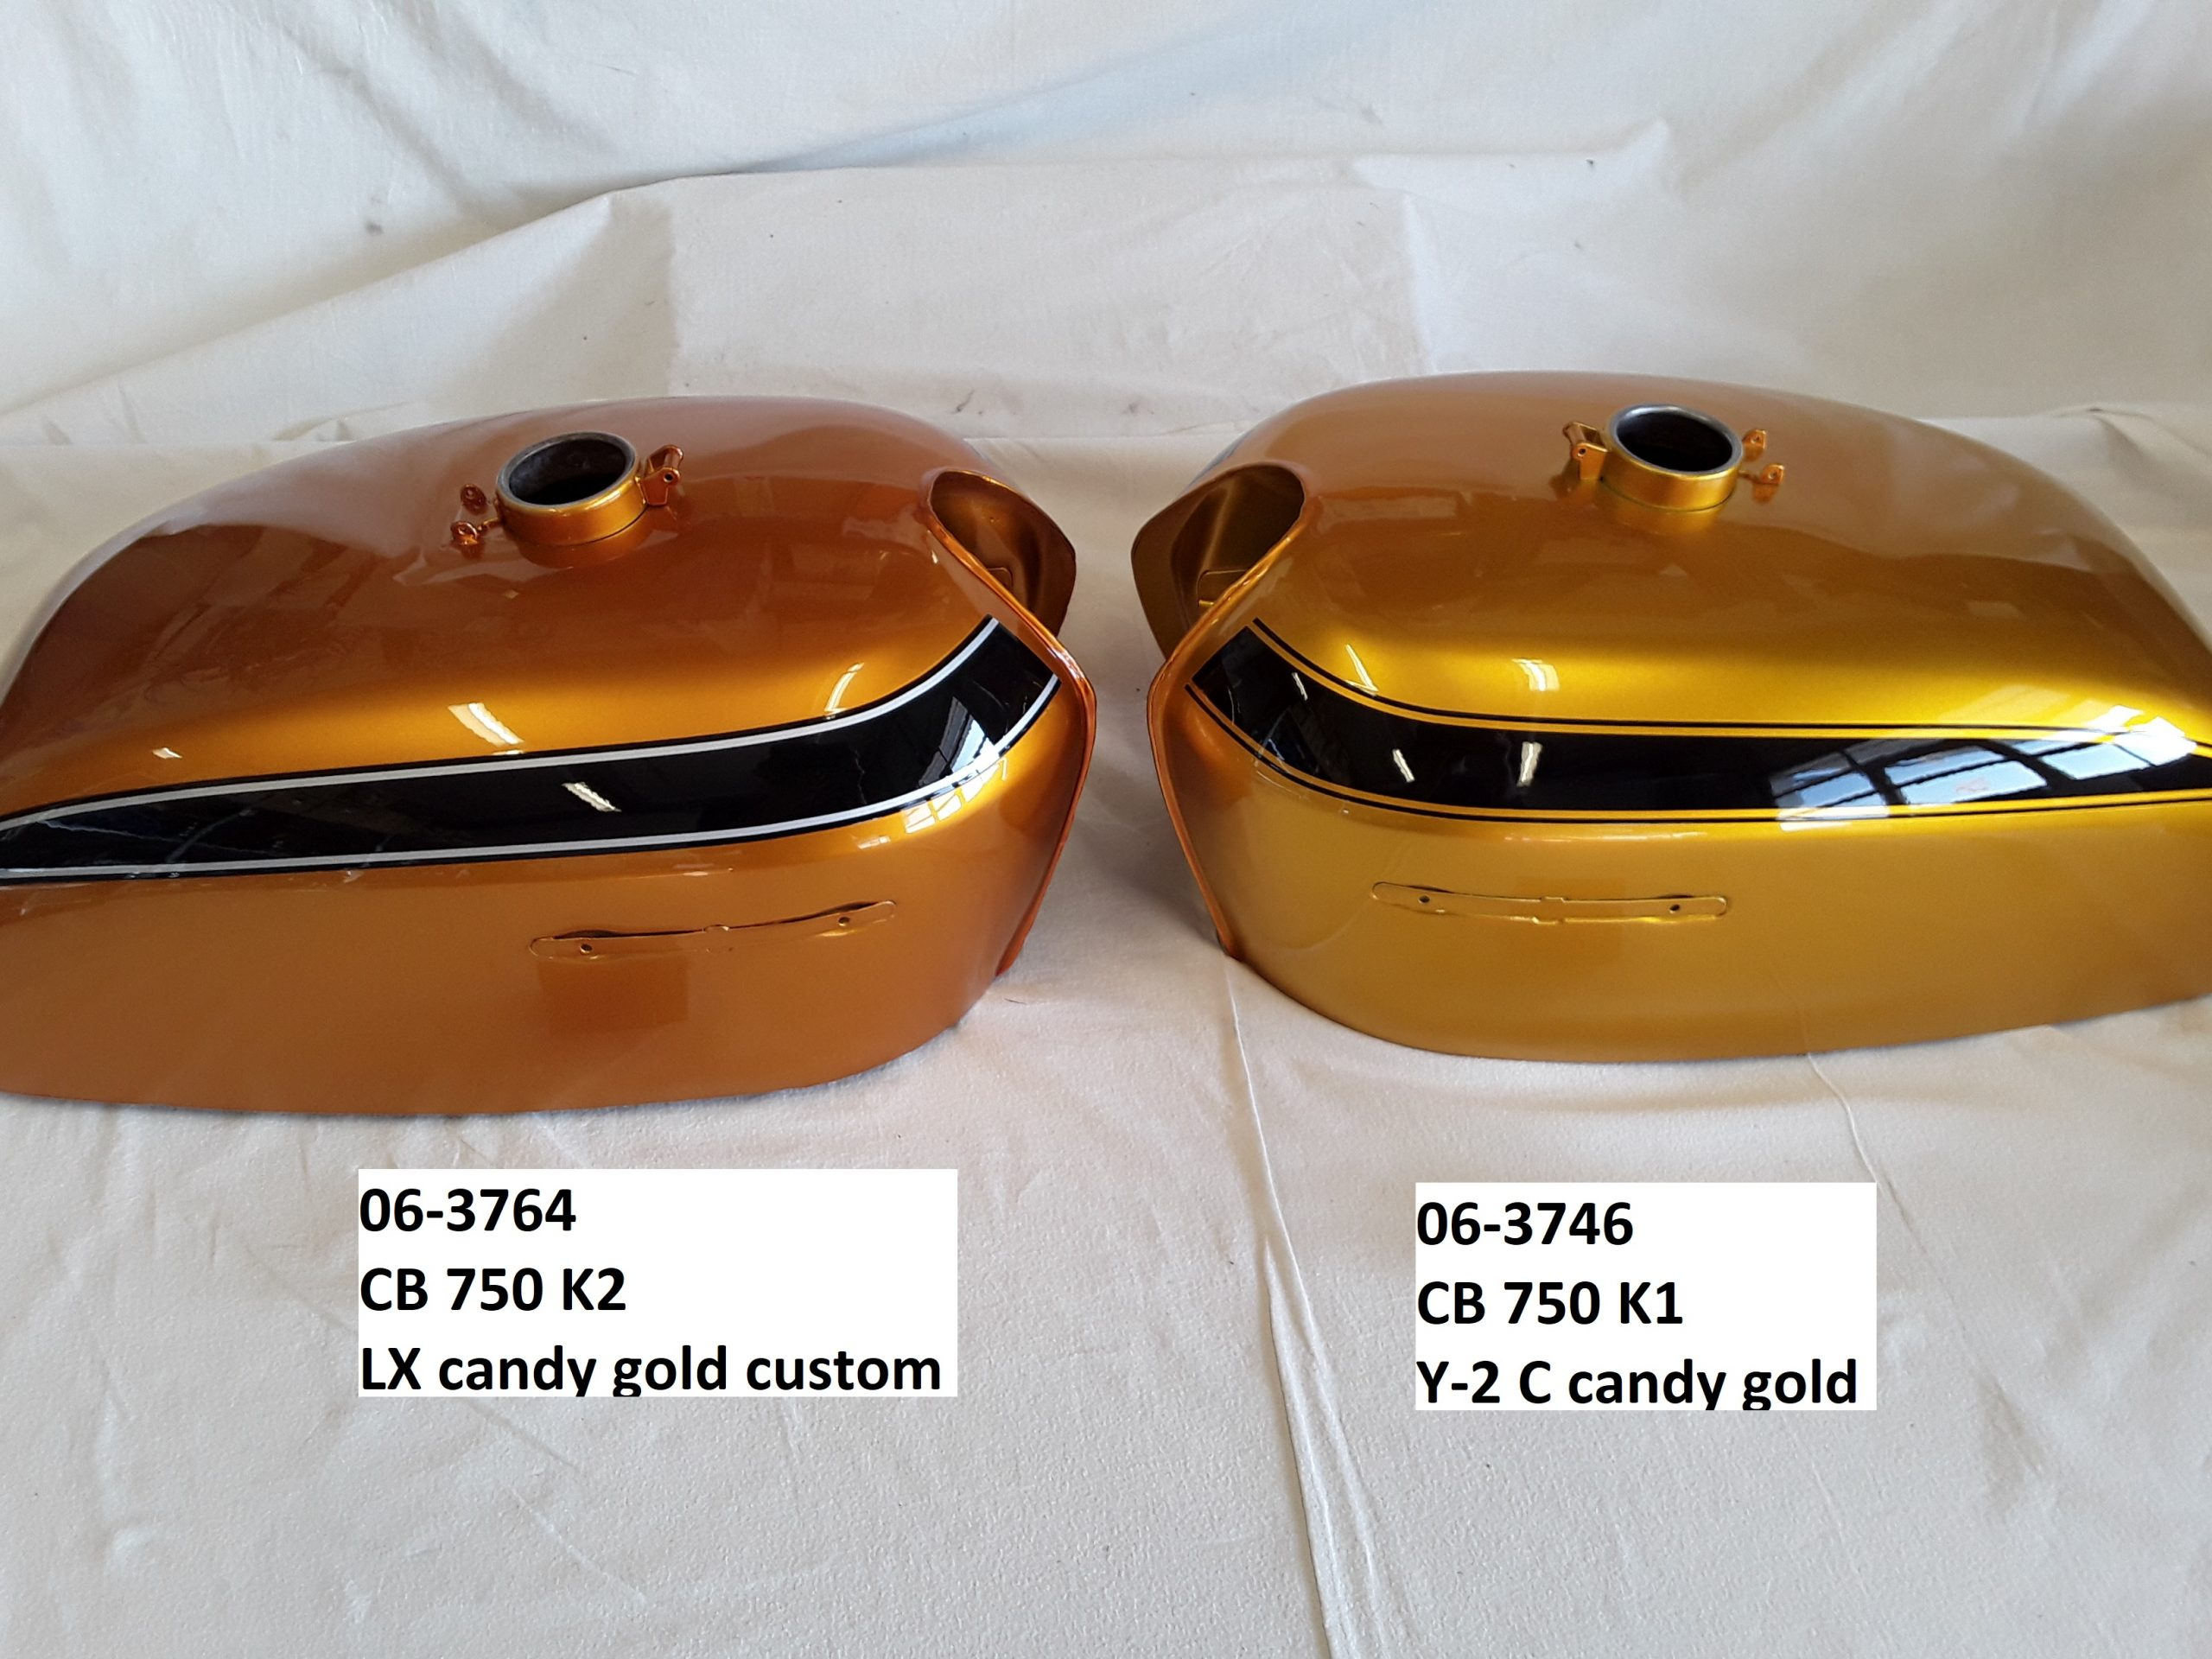 Honda CB750K2 in candy gold custom und CB750 K1 in candy gold RH-Lacke Lackiererei Motorradlackierung